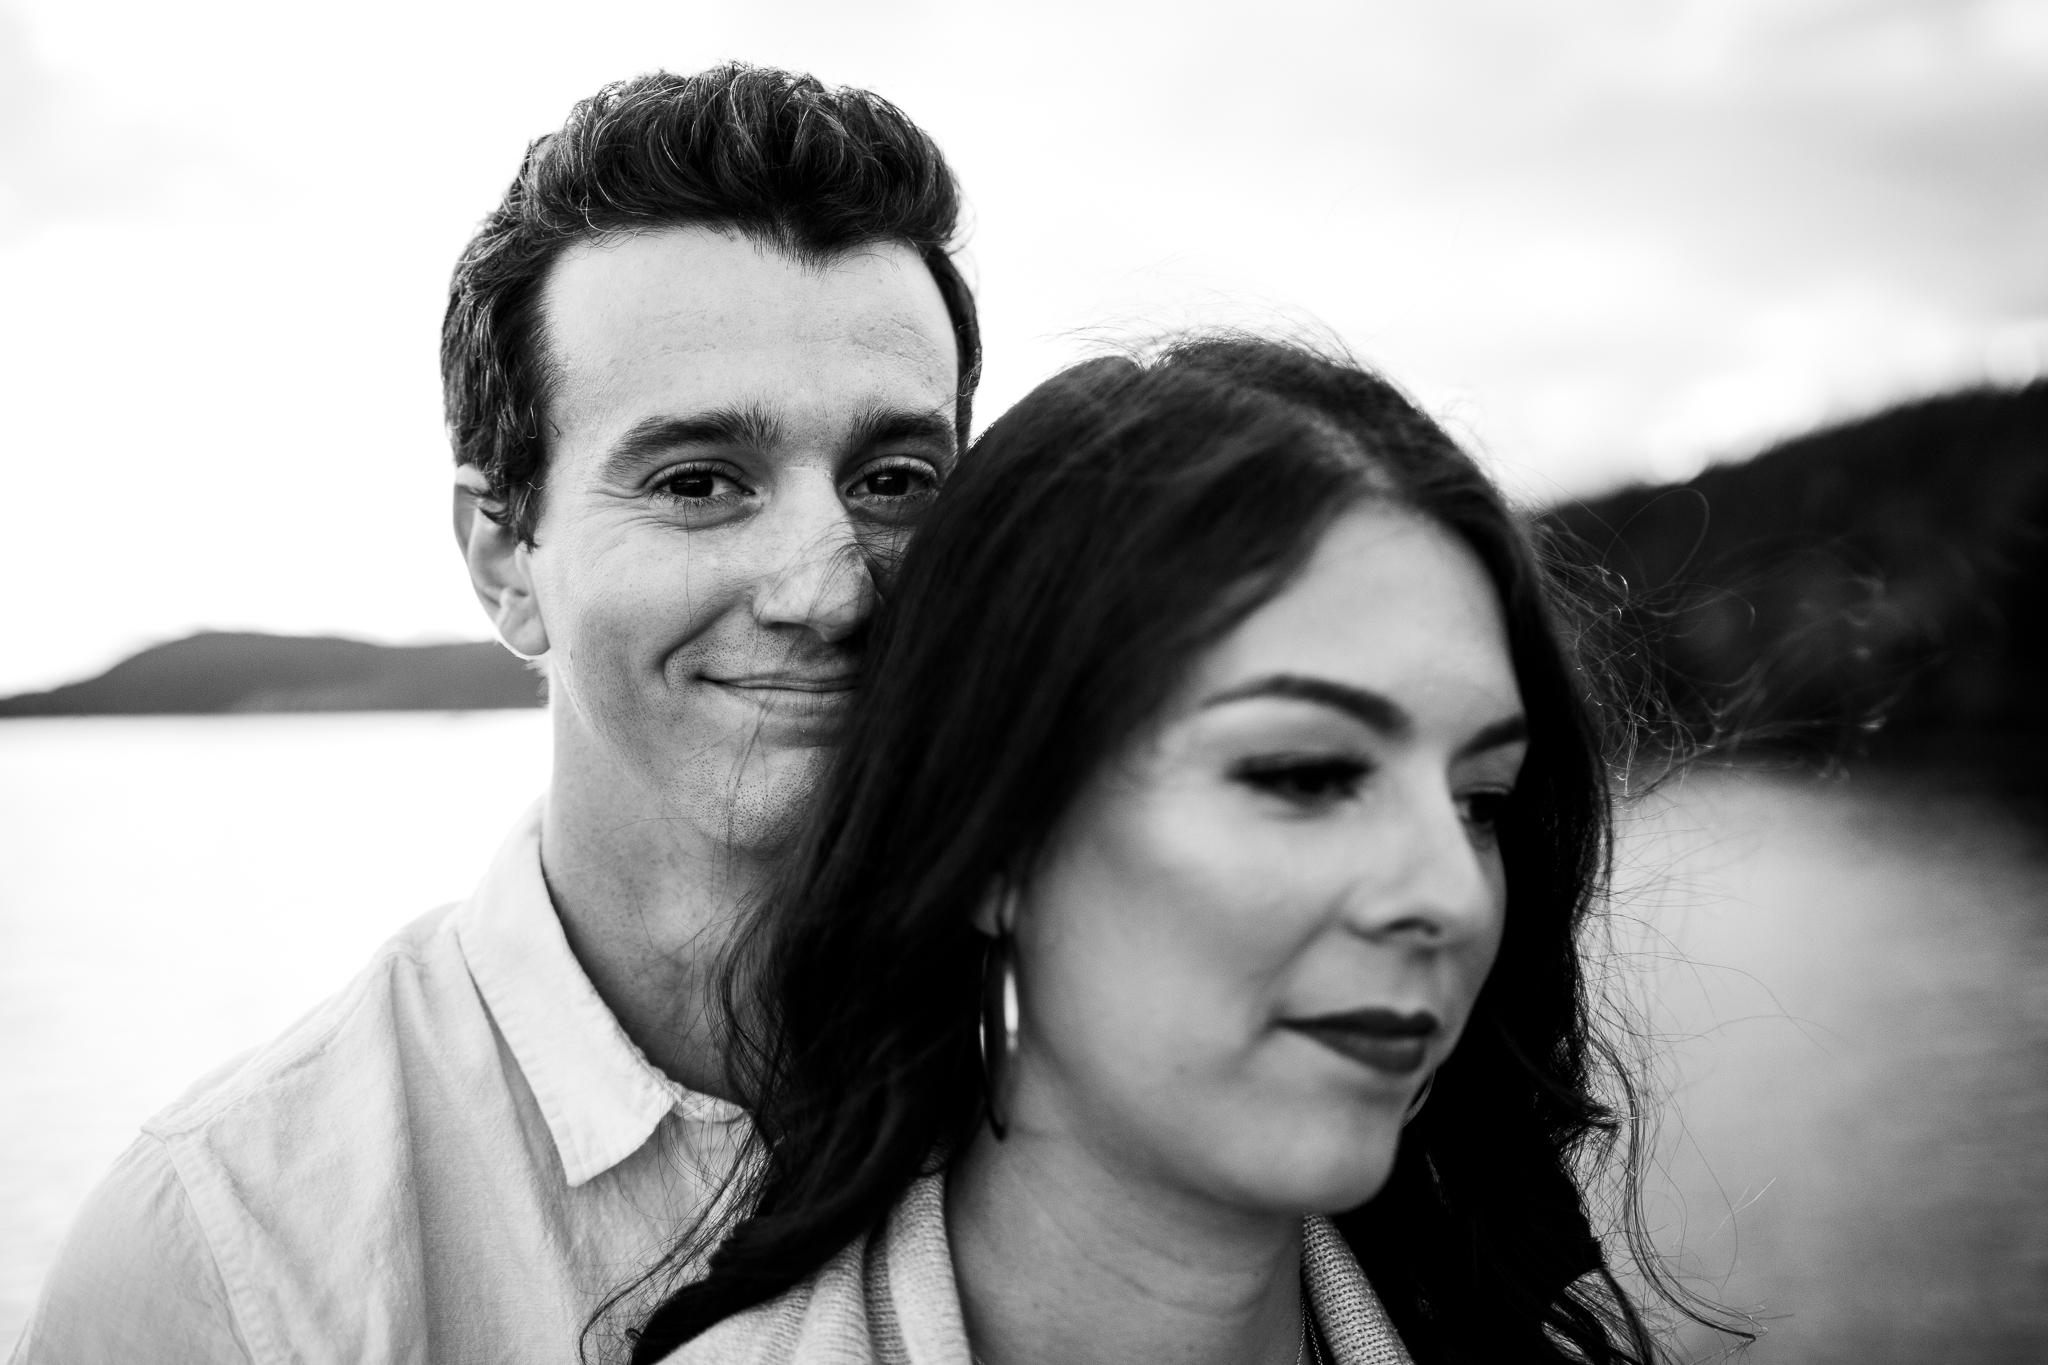 Photo of Buntzen Lake Anmore British Columbia Landscape Best Fun Engagement Photographer Port Moody Wedding Sunset Romantic Couple Photos 168.jpg